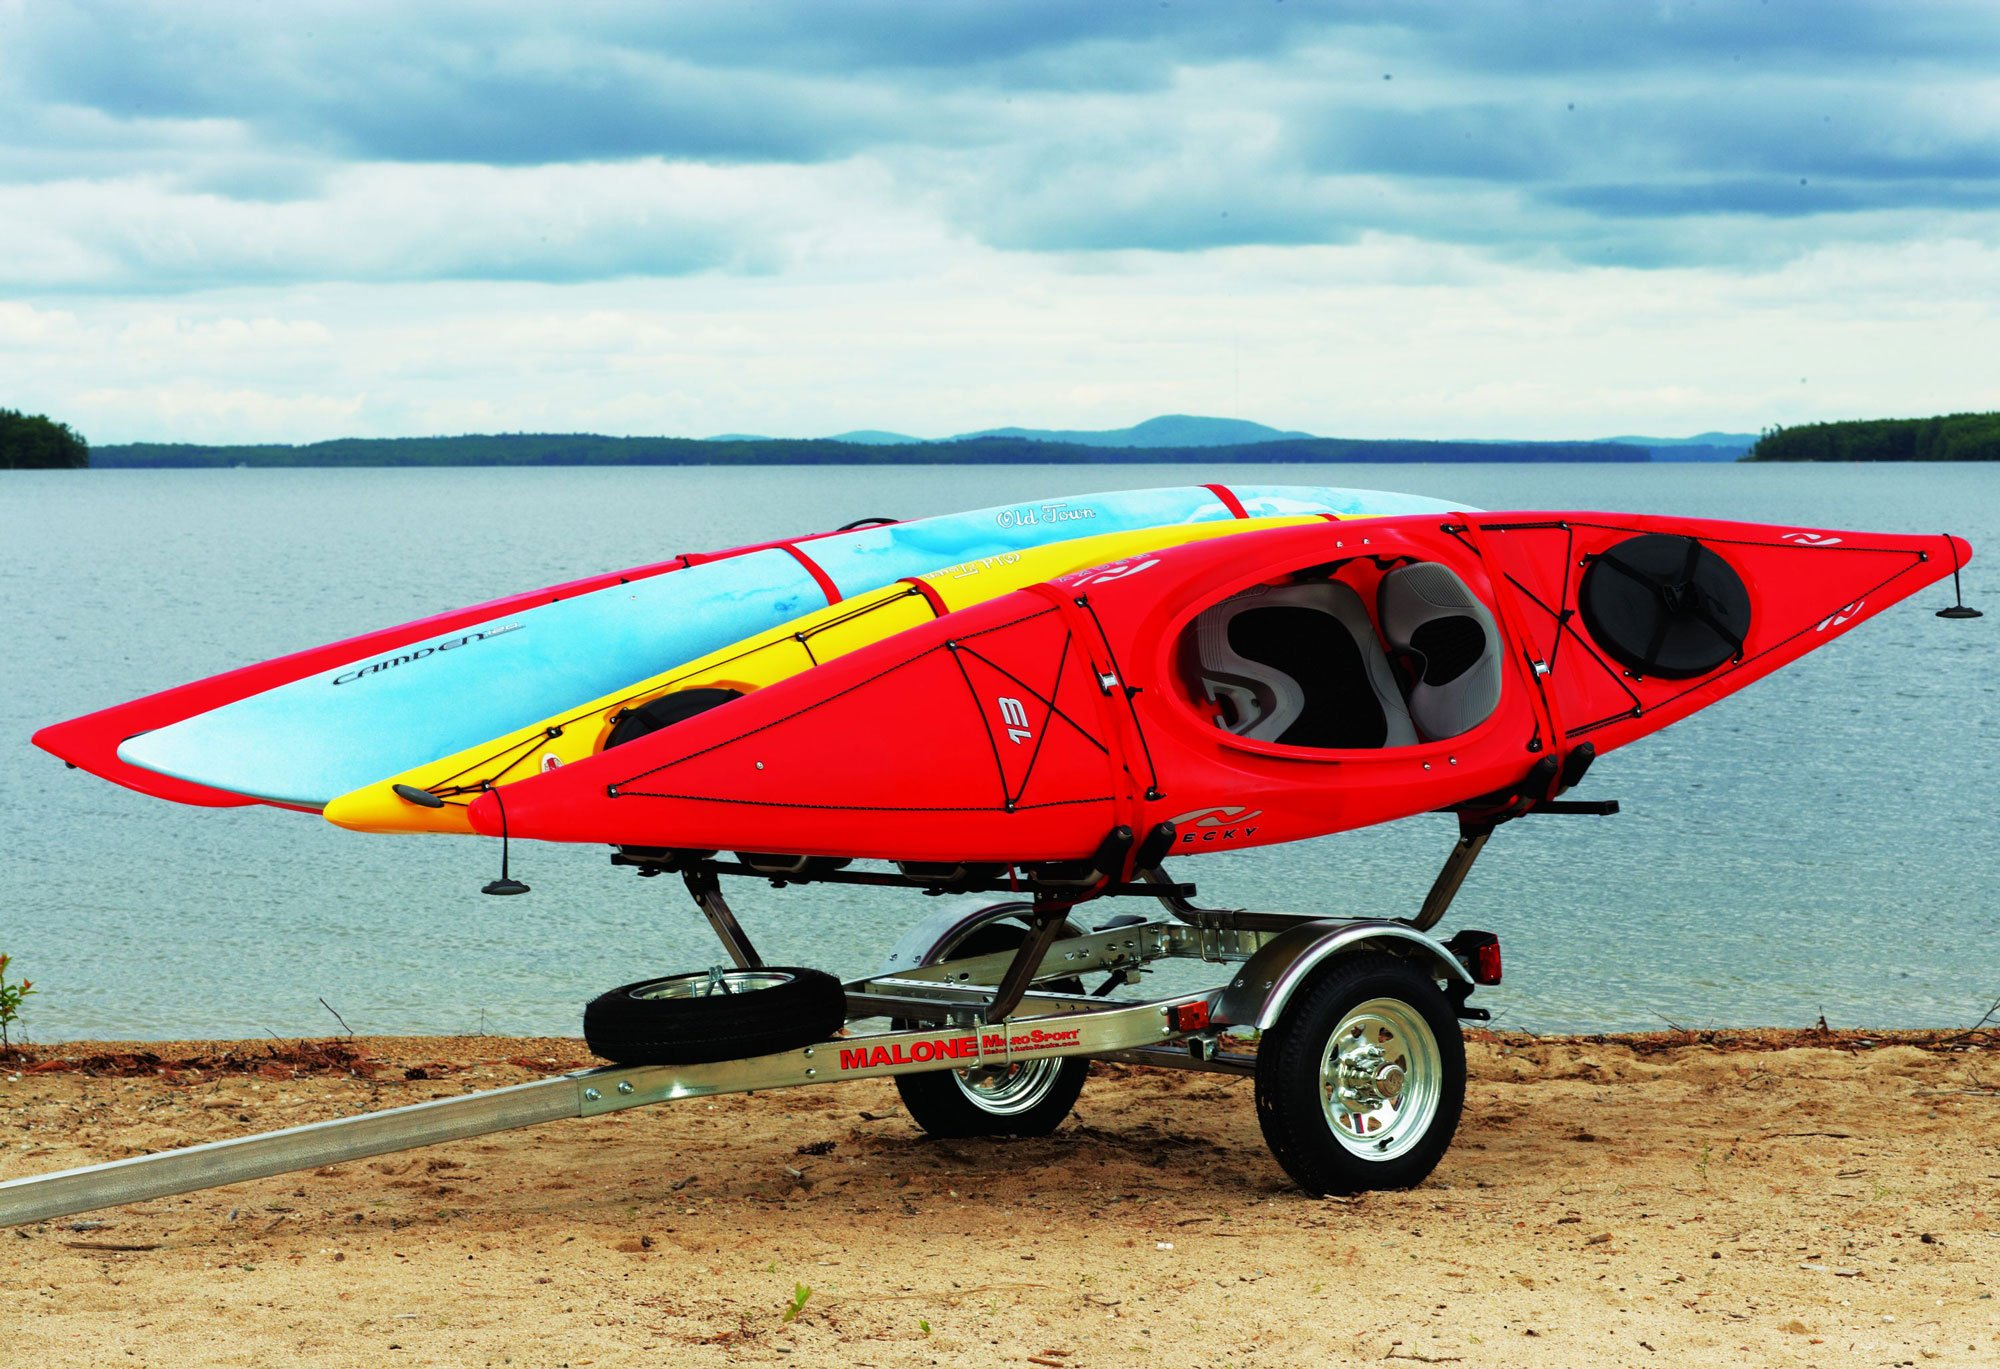 Malone Auto Racks MicroSport Trailer Kayak Transport Package with 4 Malone J-Pro2 Kayak Carriers by Malone